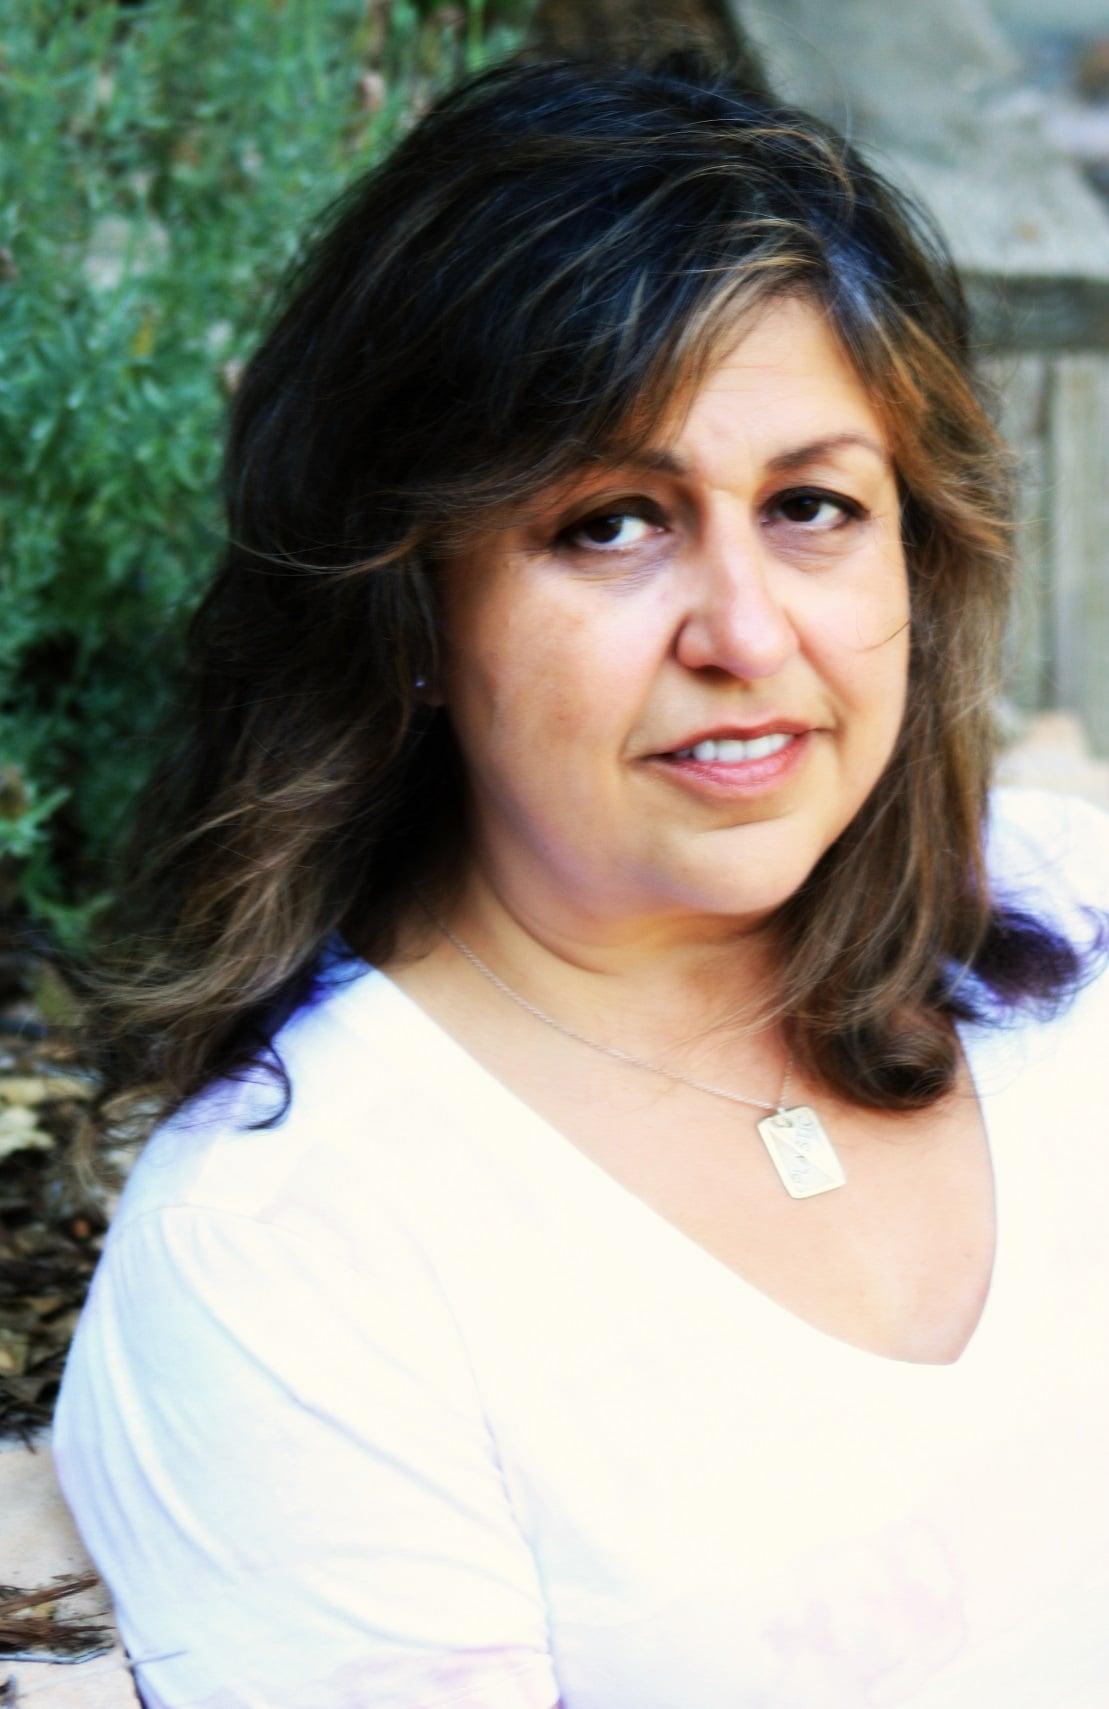 Daniella from Carmel